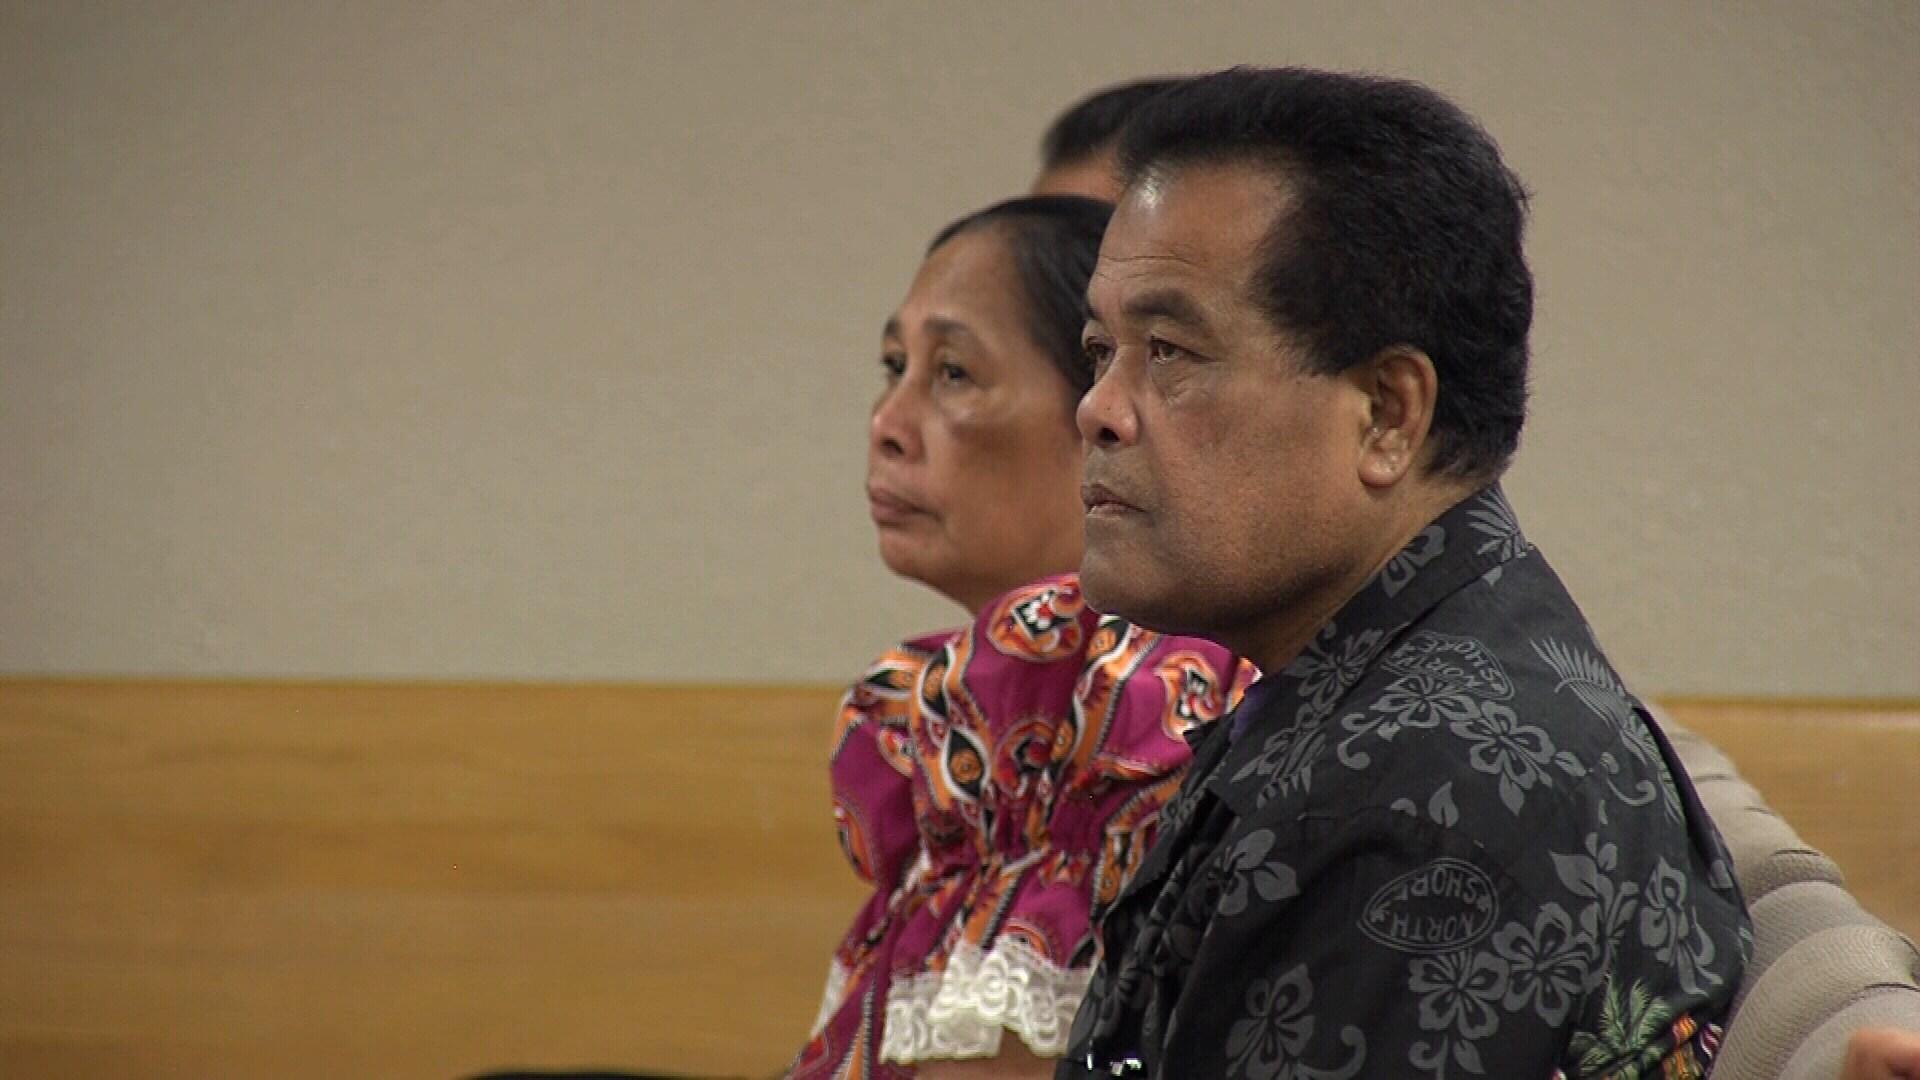 Church members praying for friends' safe return